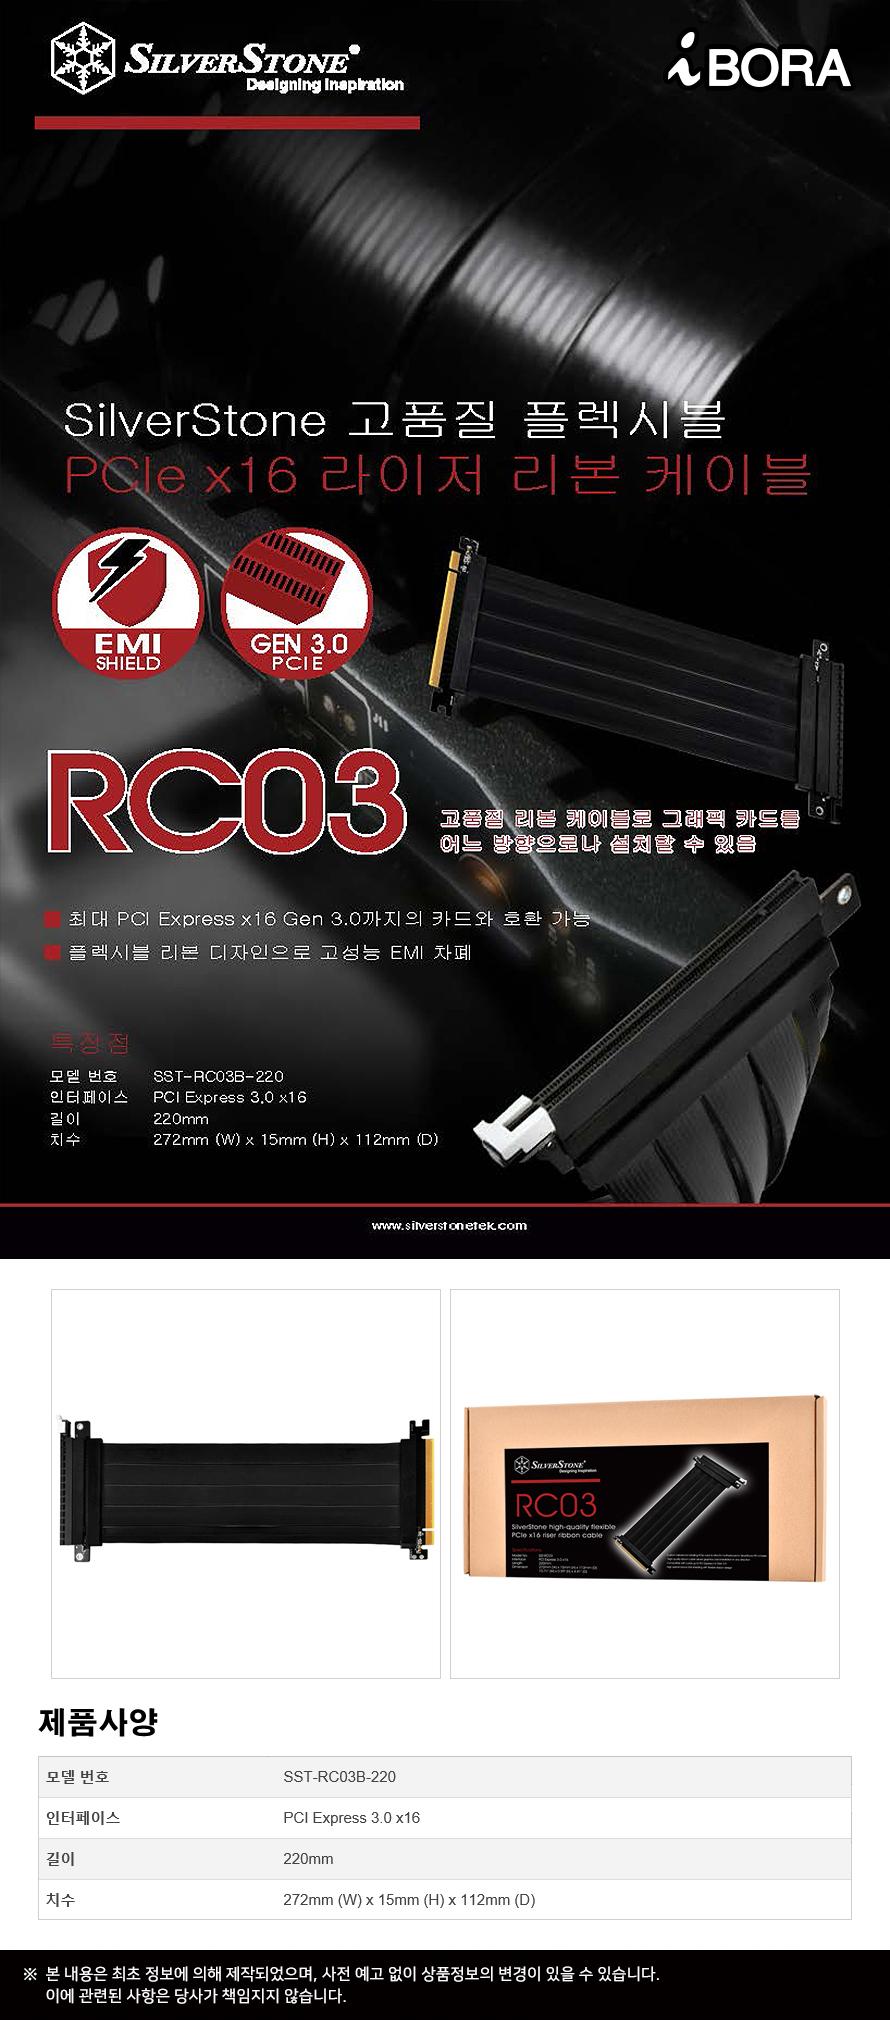 SilverStone SST-RC03B-220 라이저 케이블